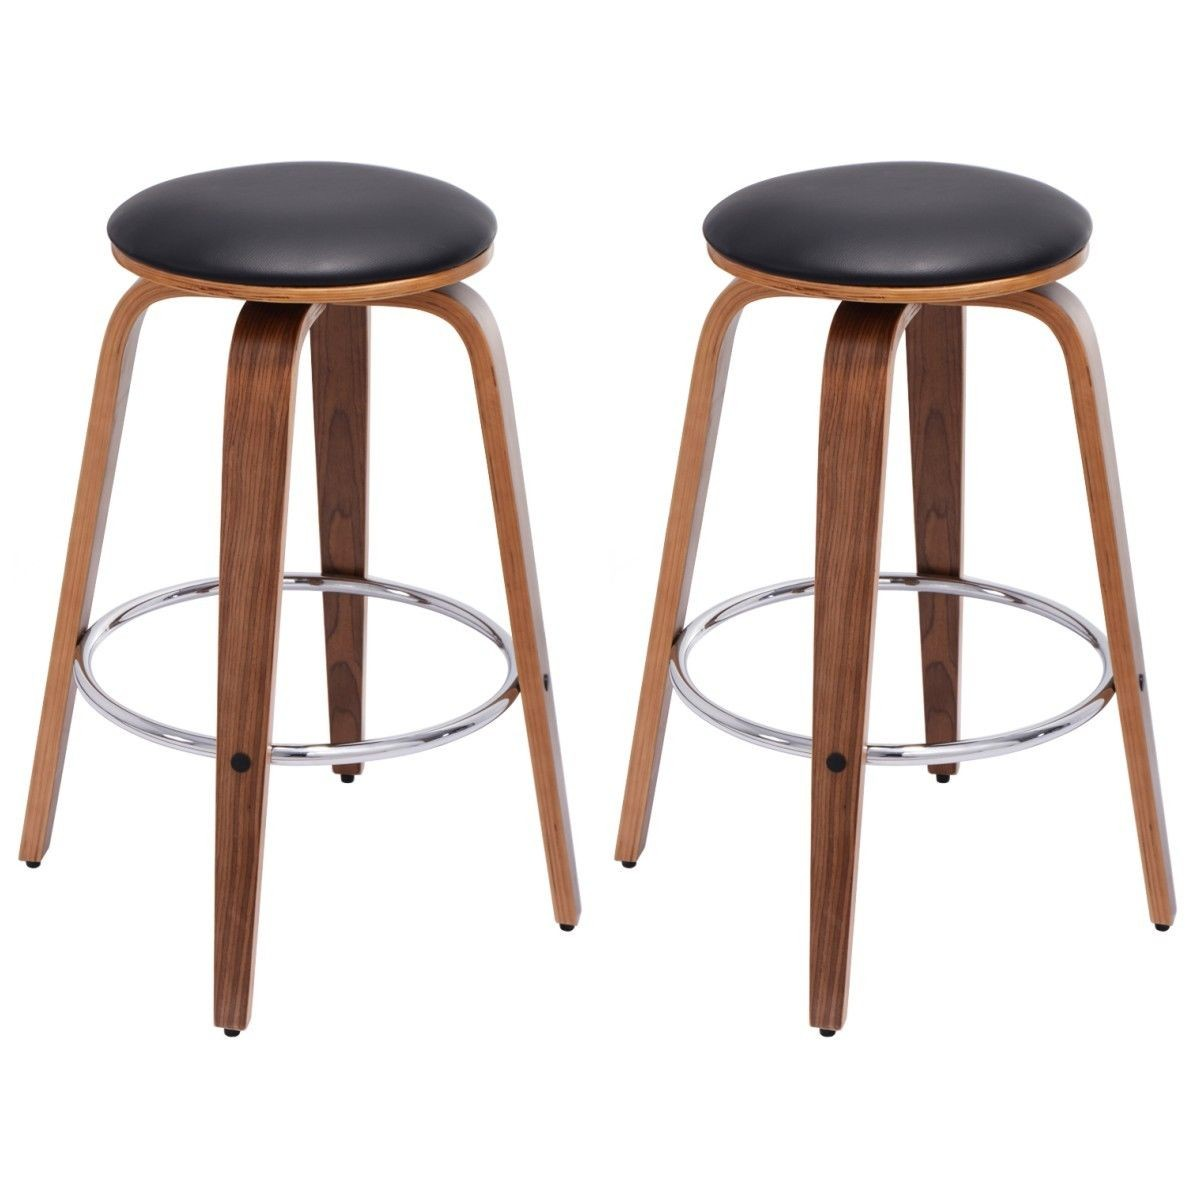 Set Of 2 Swivel Bentwood Bar Stool Pu Leather Modern